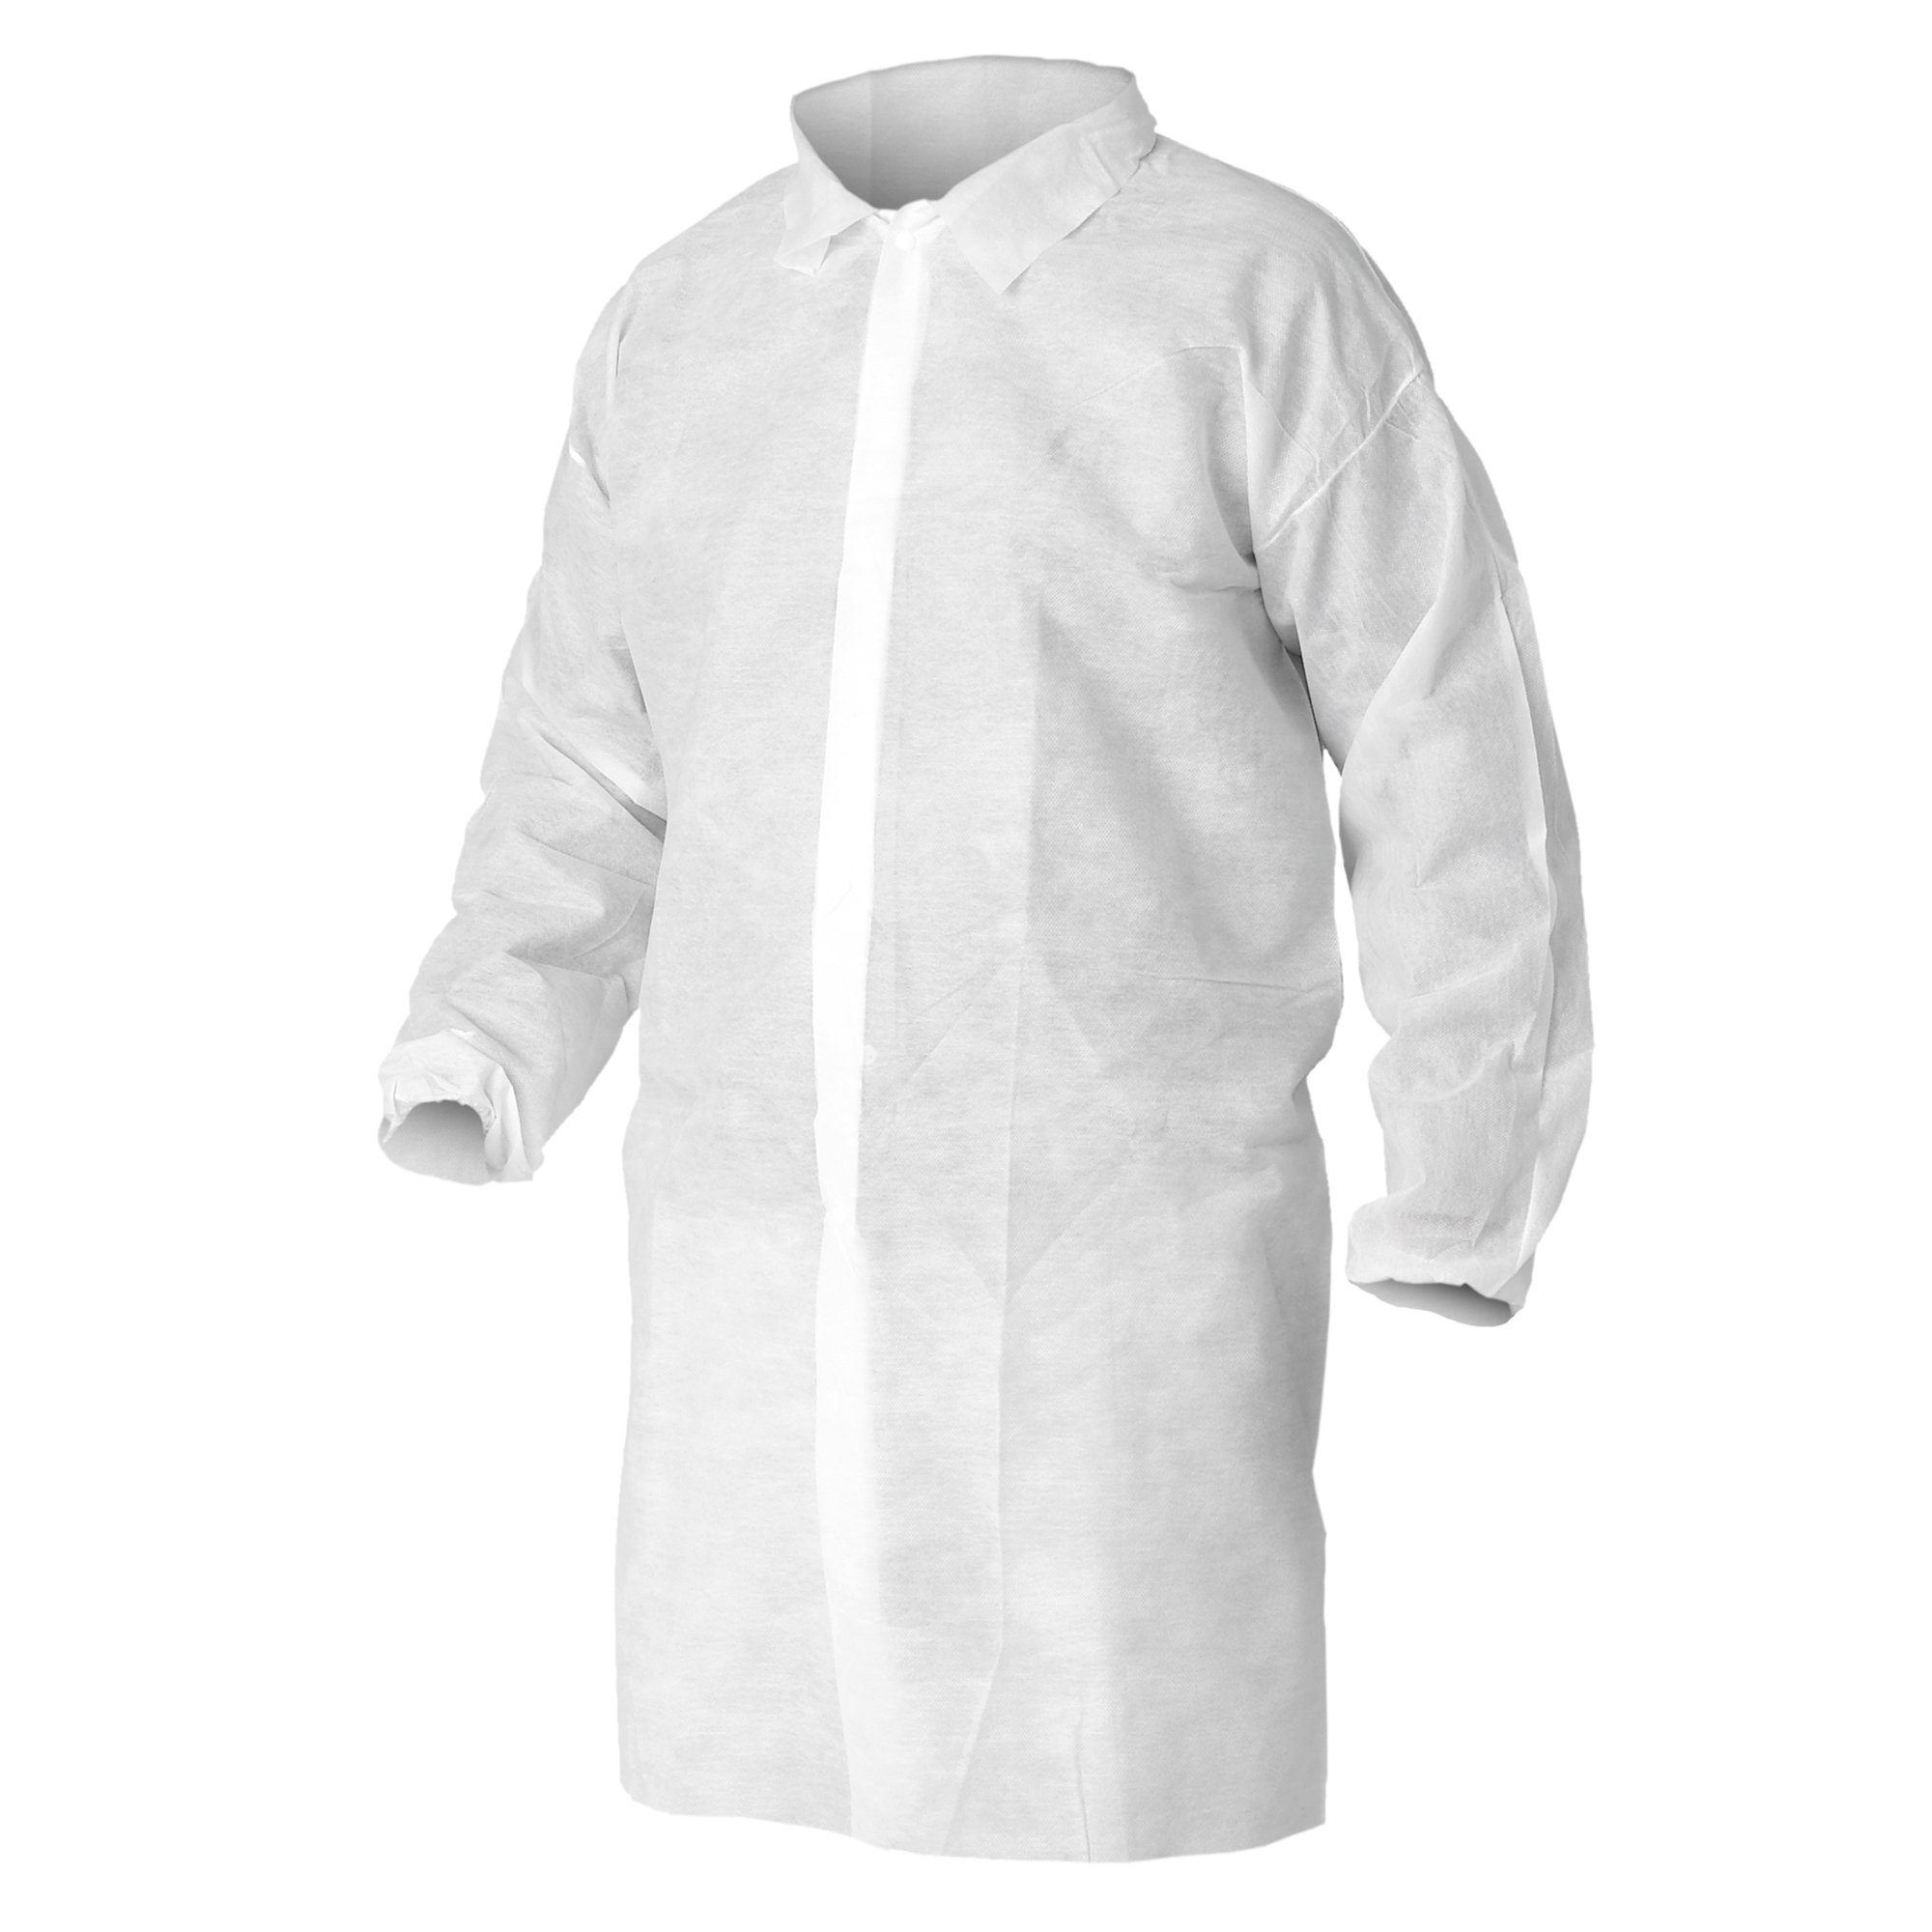 Kleenguard A10 Light Duty Lab Coat  (40103), Snap Front, Elastic Wrists, Large, White, 50 Coats / Case